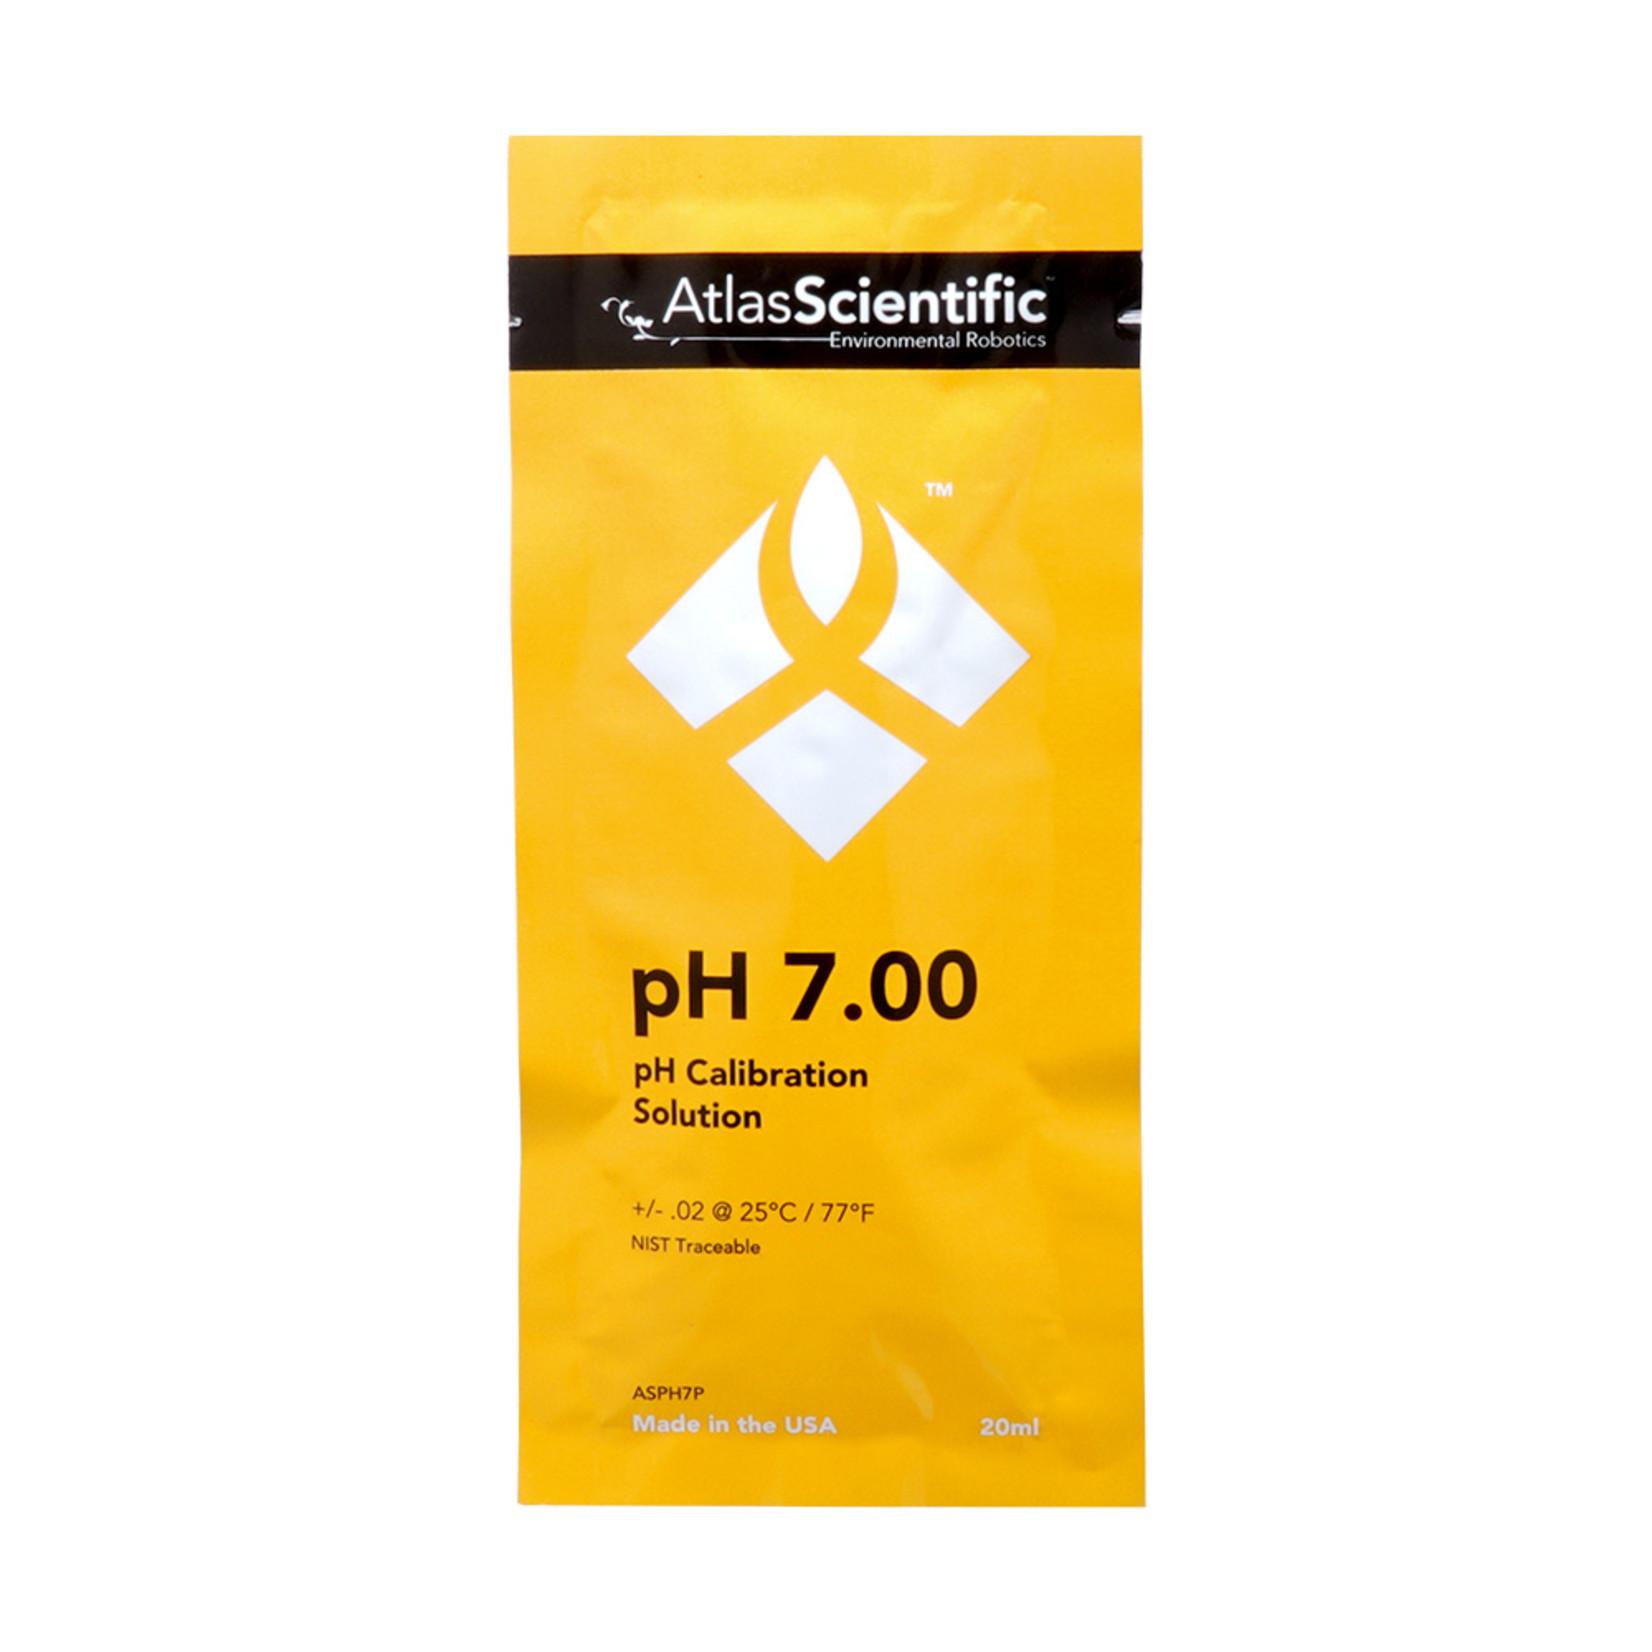 Atlas Scientific pH 7.00 Calibration Solution Pouches (Box of 25)